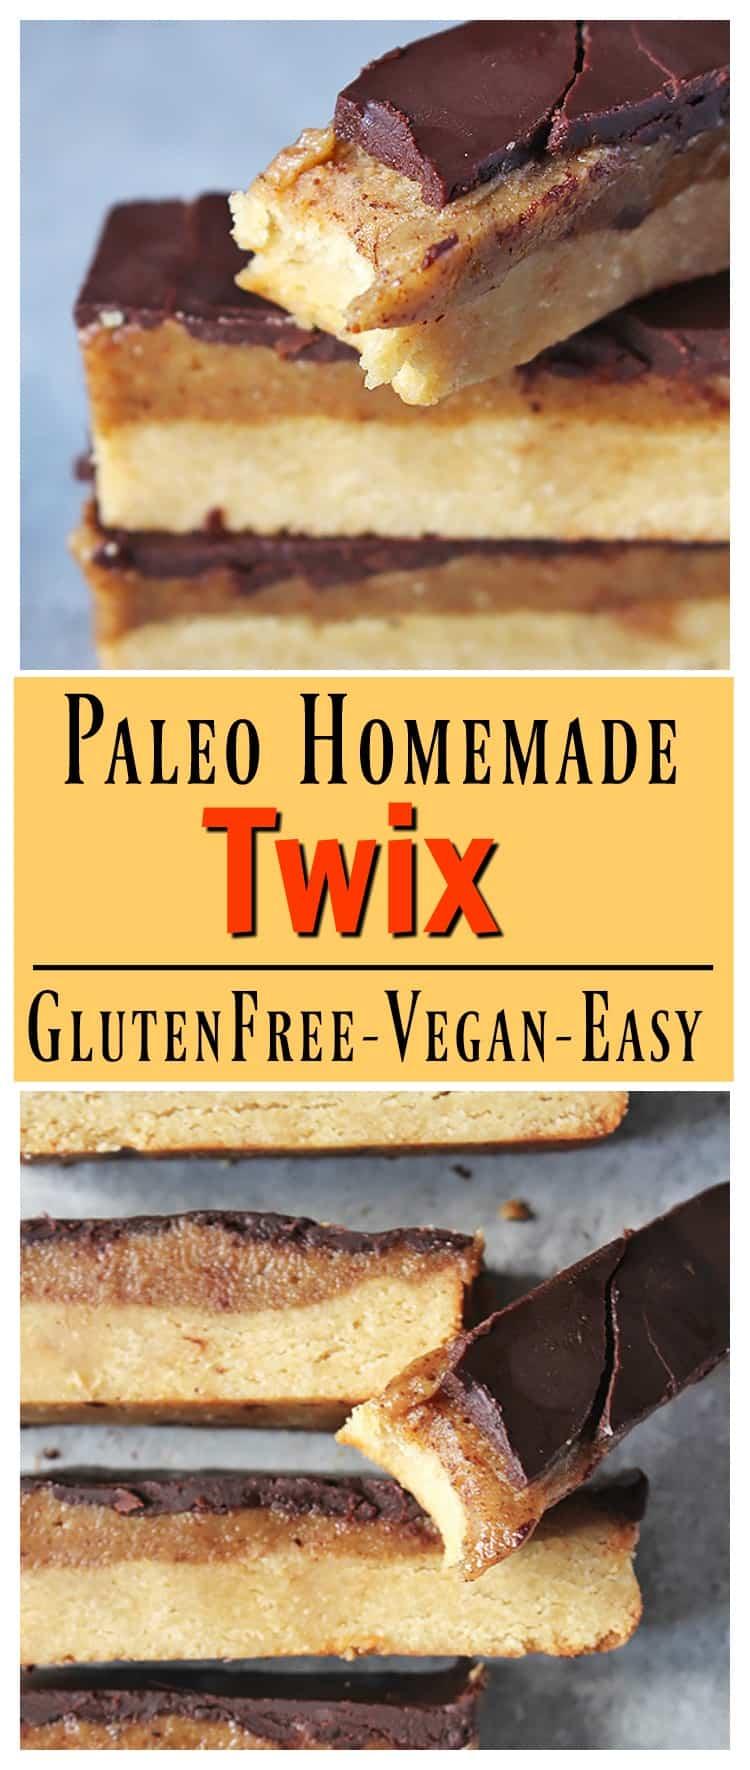 Paleo Homemade Twix Bars